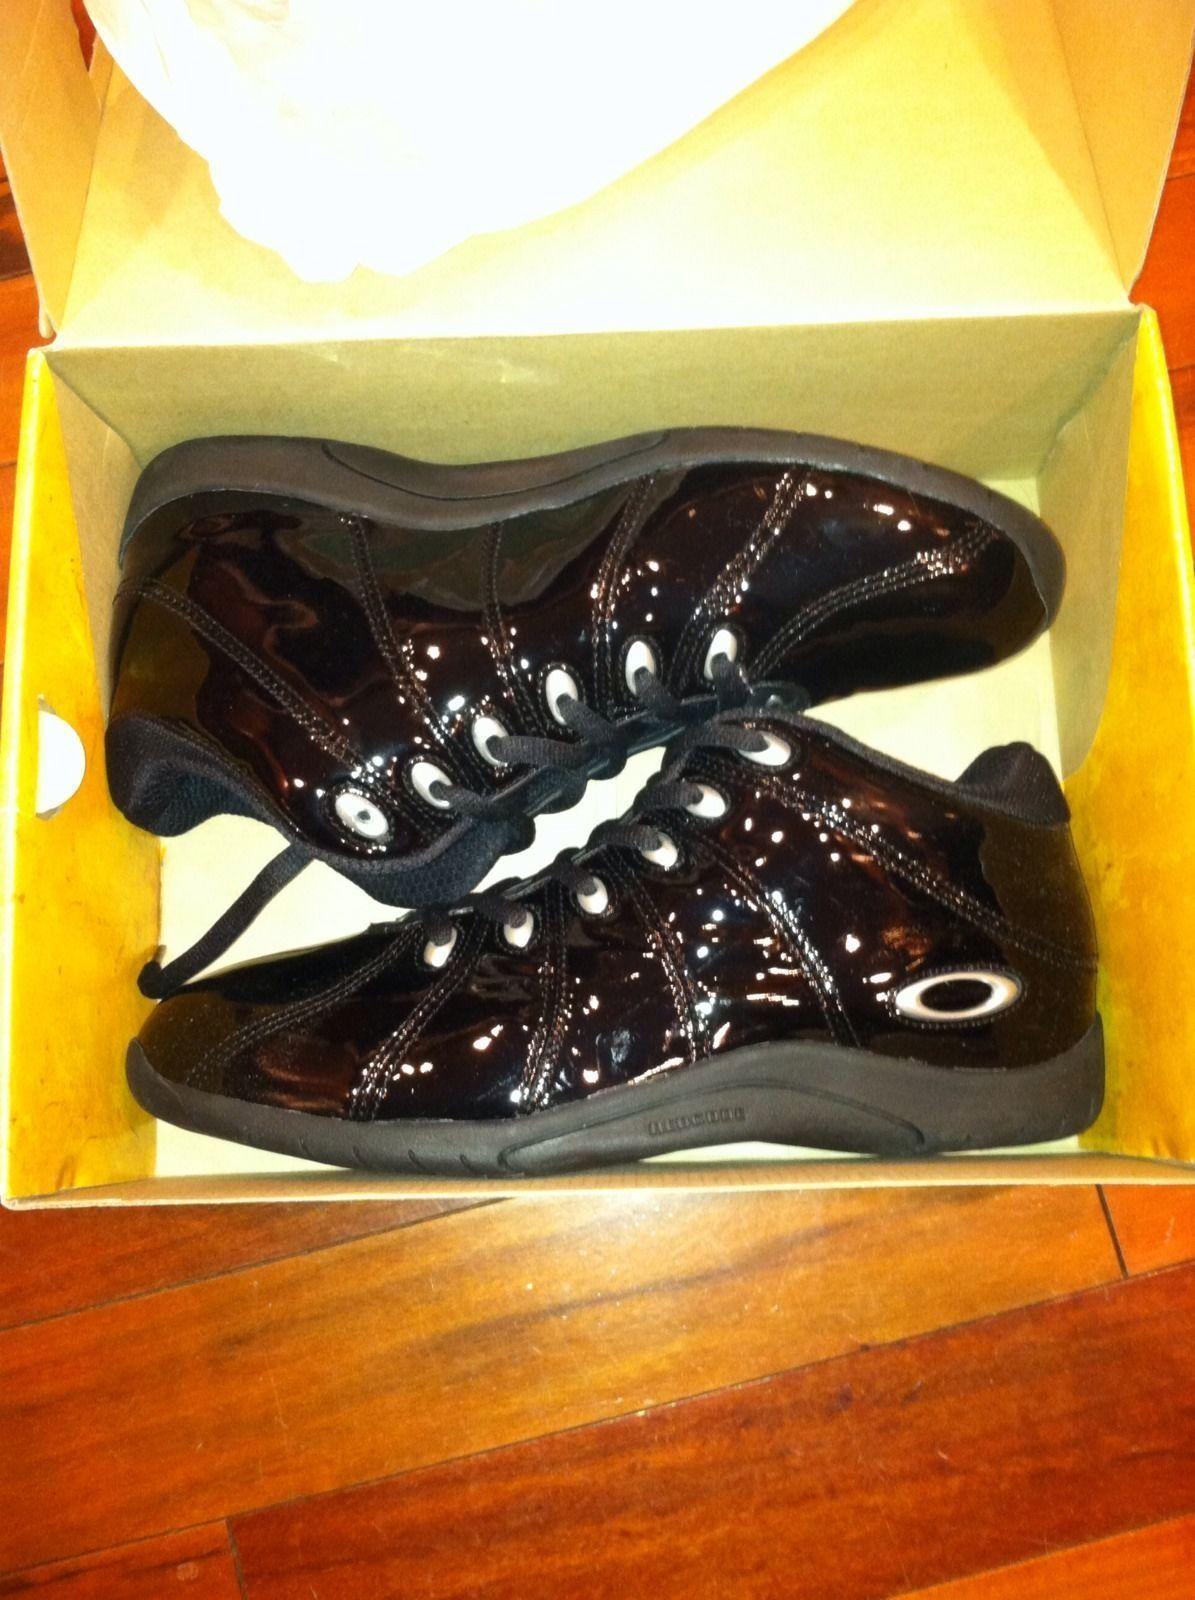 Oakley Sequel Shoes In Black Chrome - Sequel.JPG